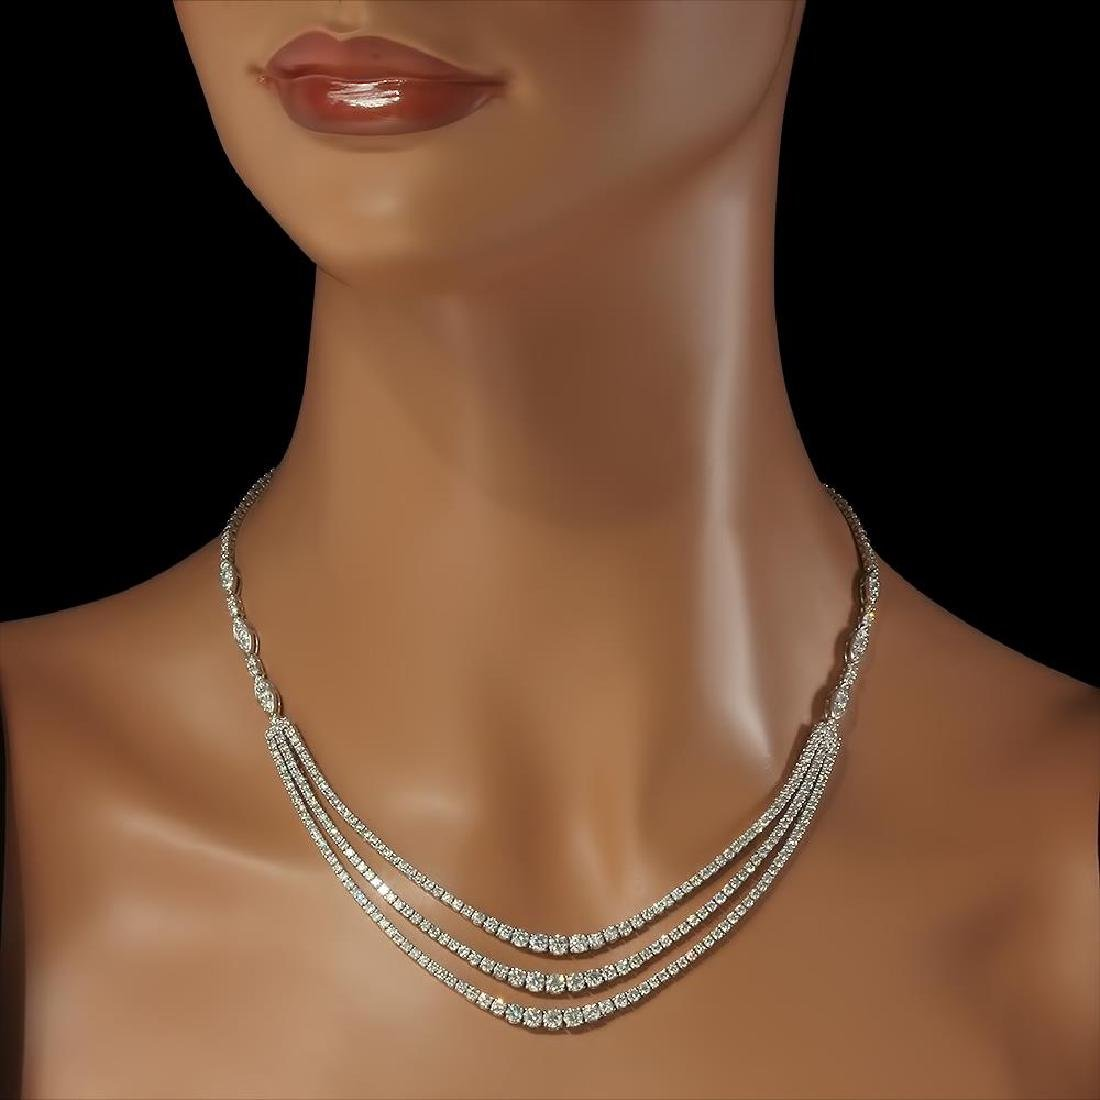 18K Gold 11.20ct Diamond Necklace - 3